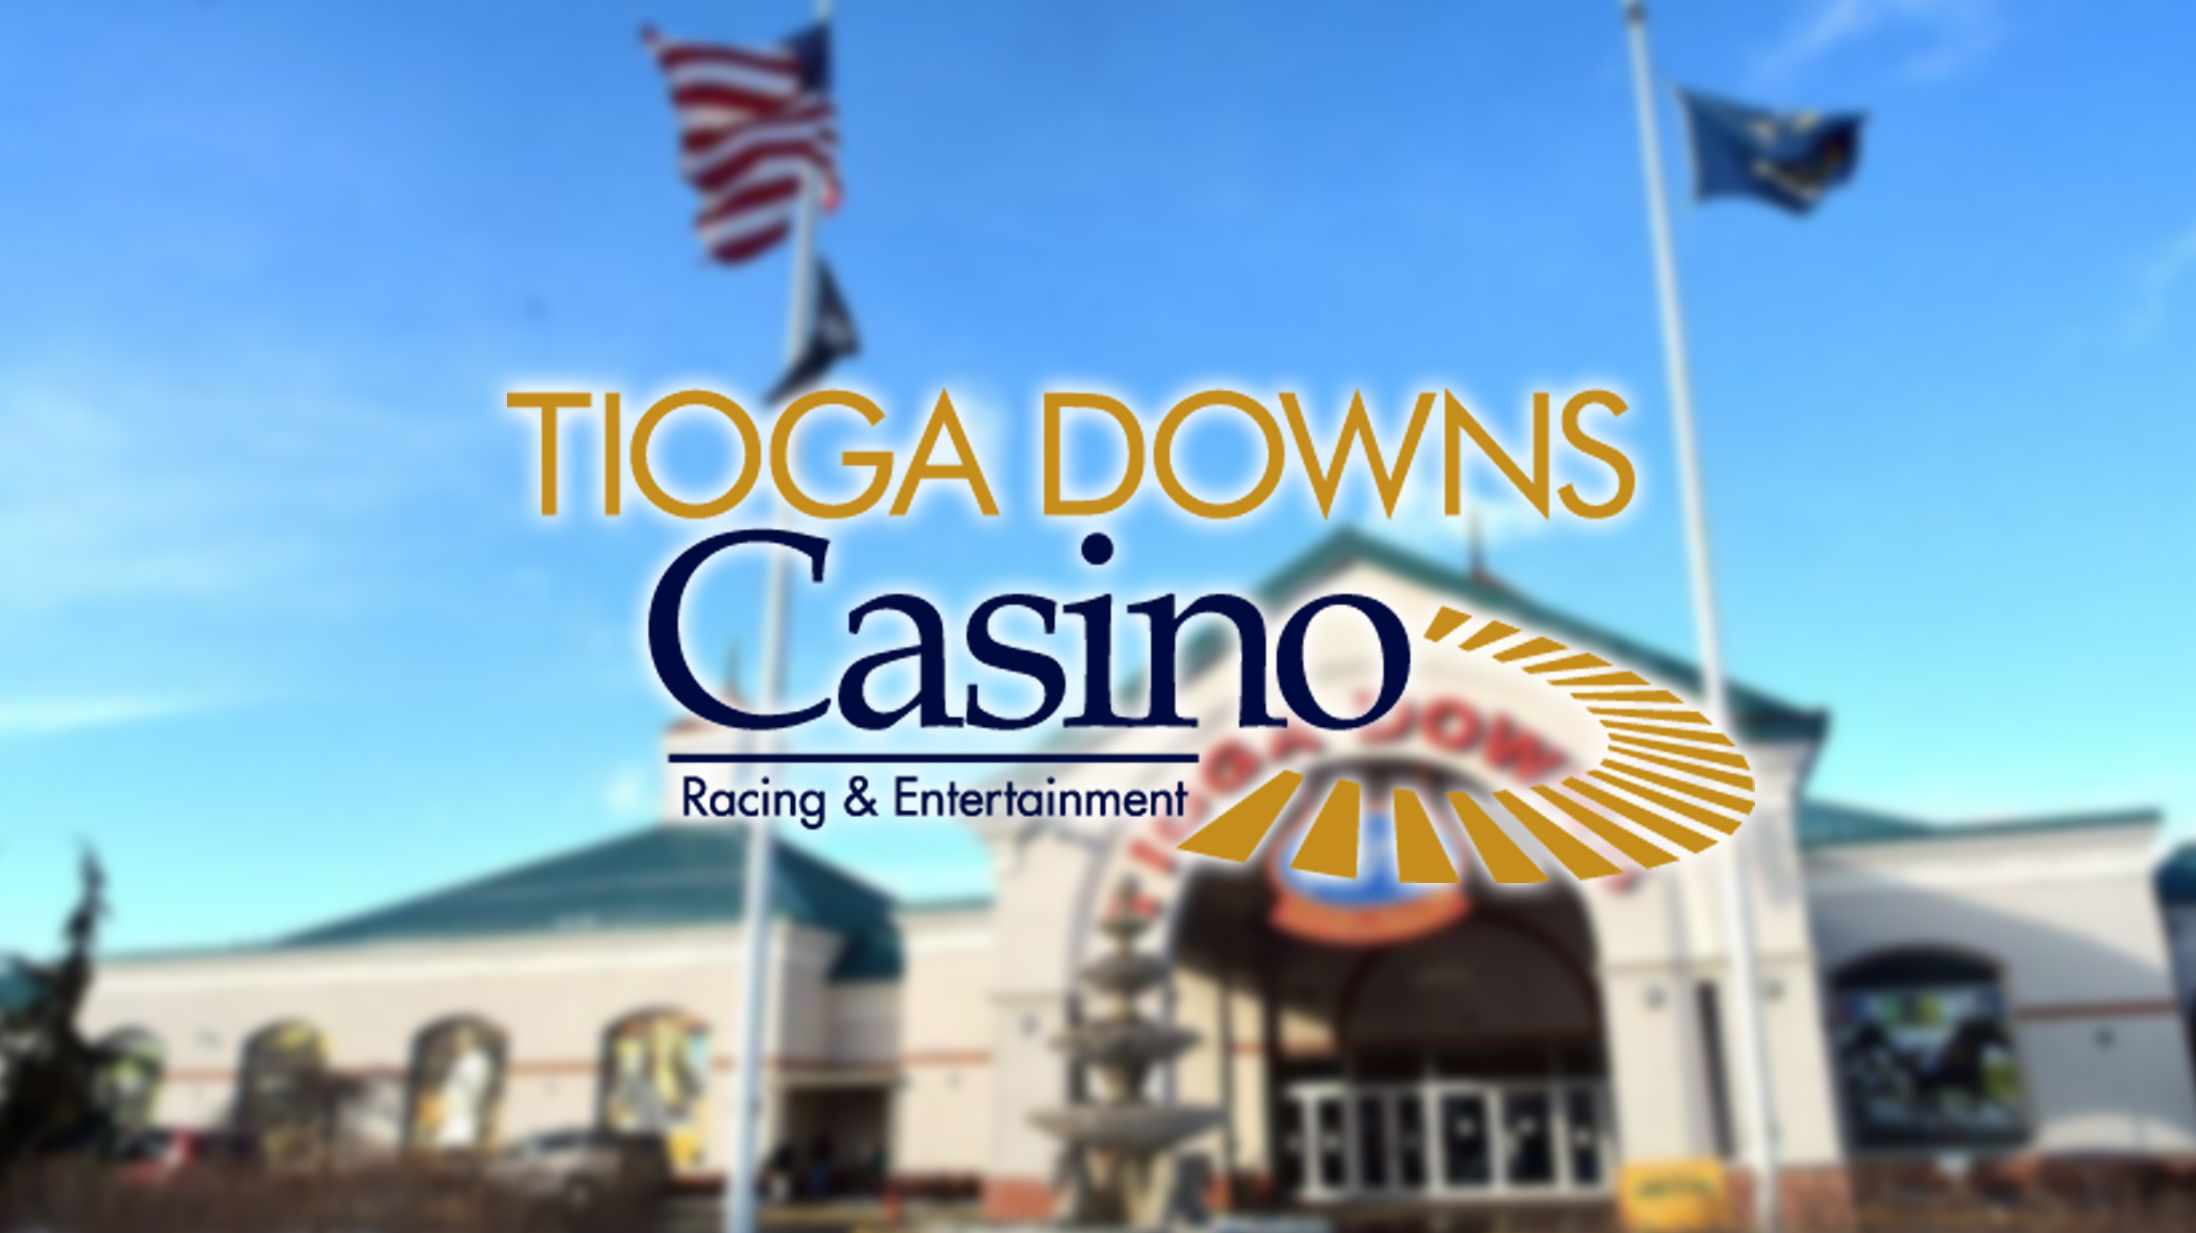 Tioga Downs For WEB 2_1490634627158.jpg